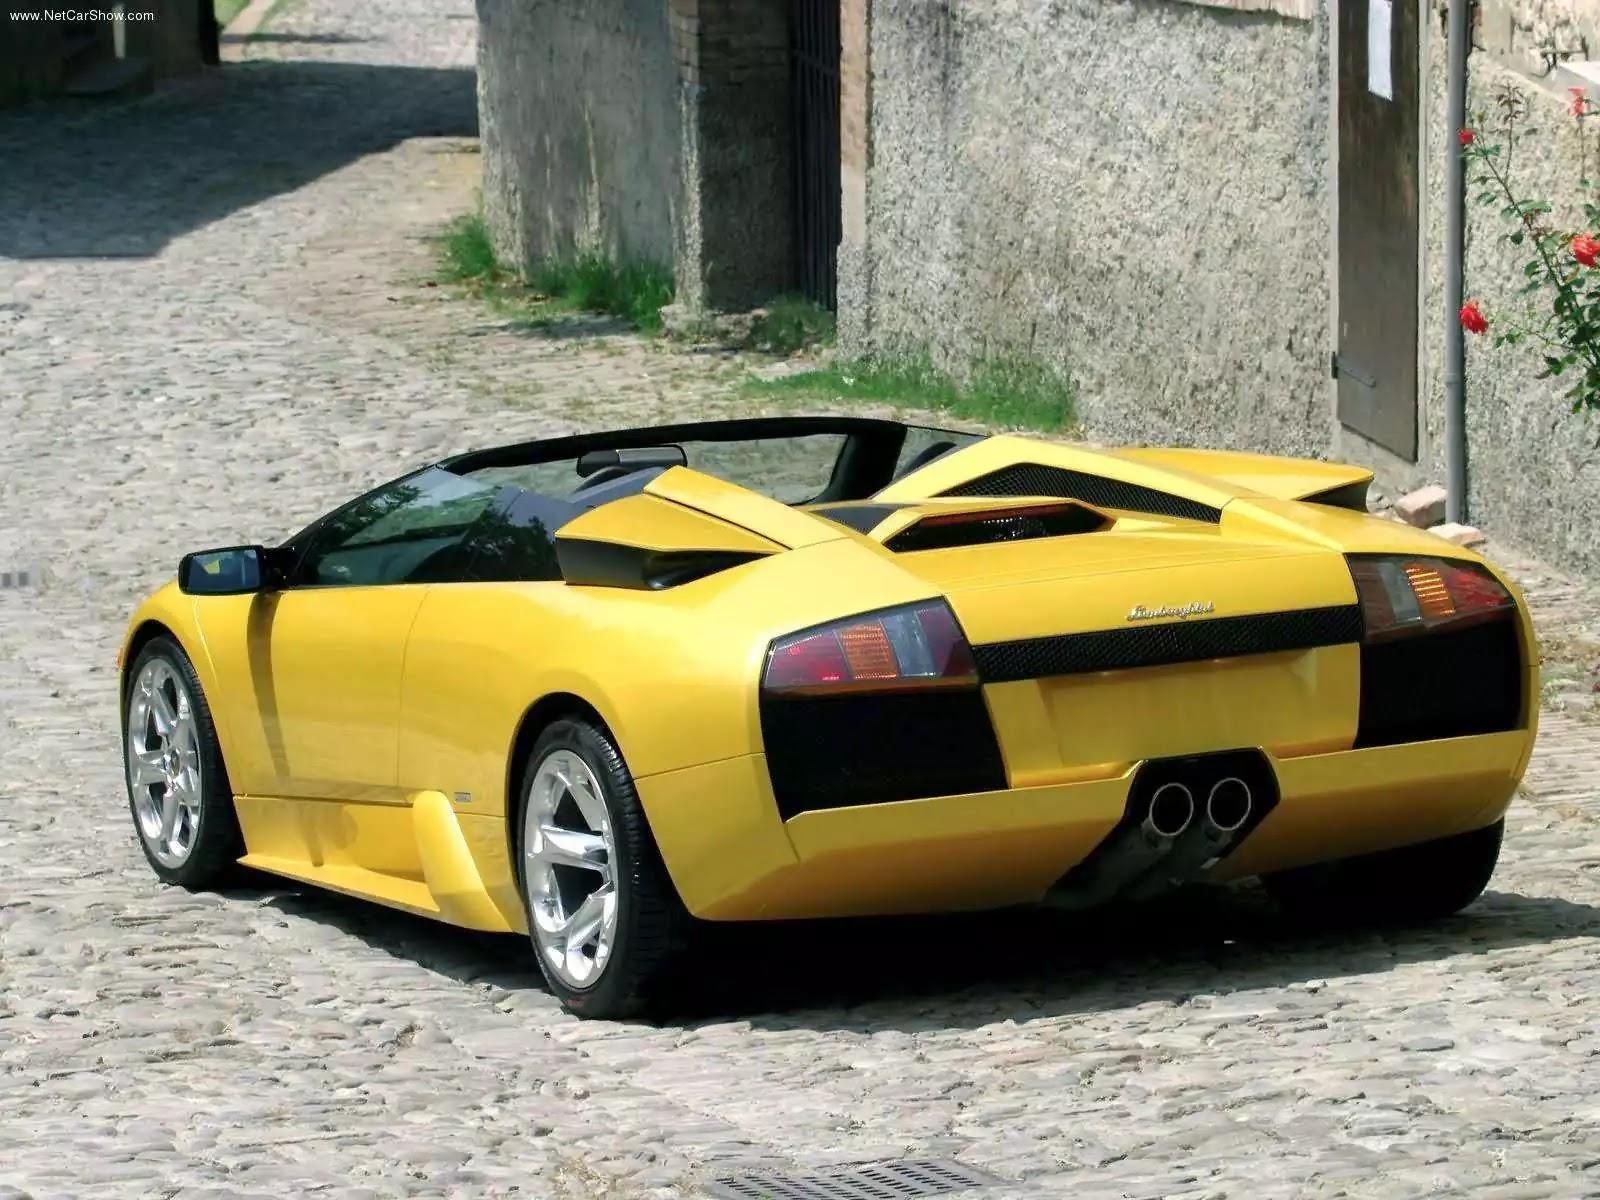 Hình ảnh siêu xe Lamborghini Murcielago Roadster 2004 & nội ngoại thất